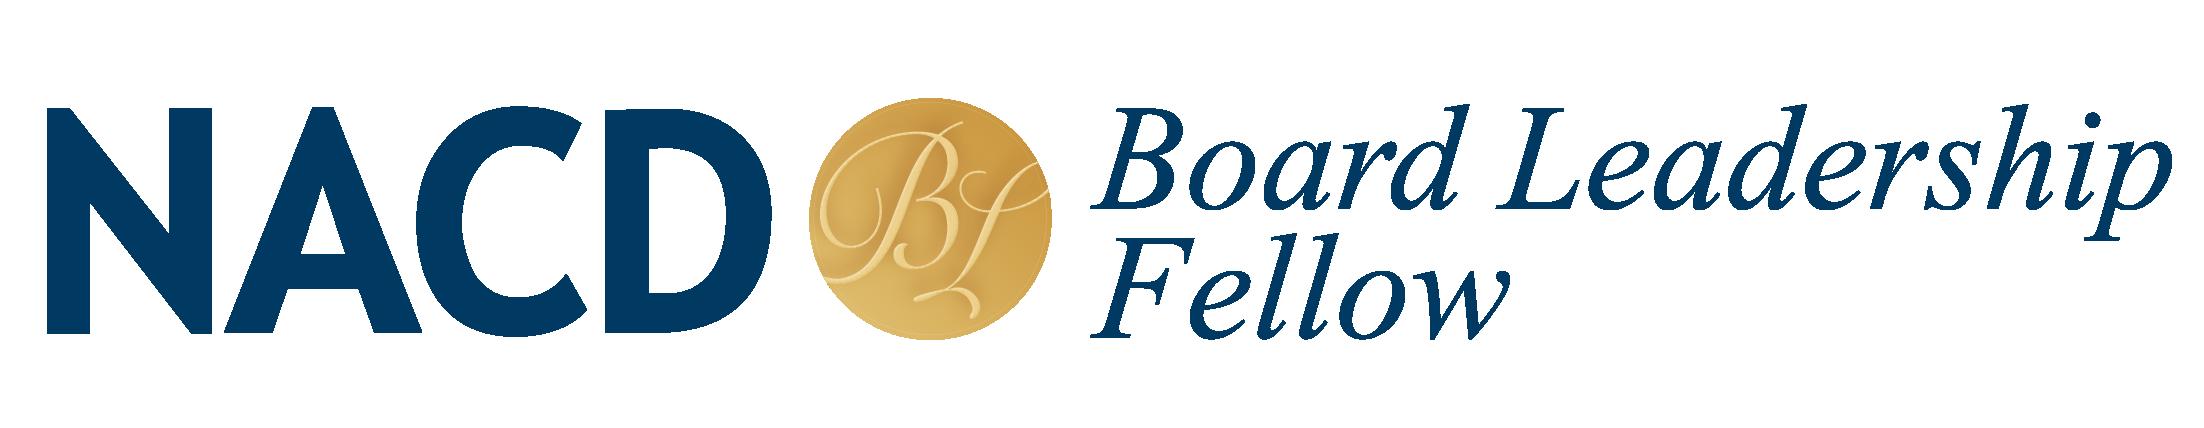 NACD Board Leadership Fellow Logo.png